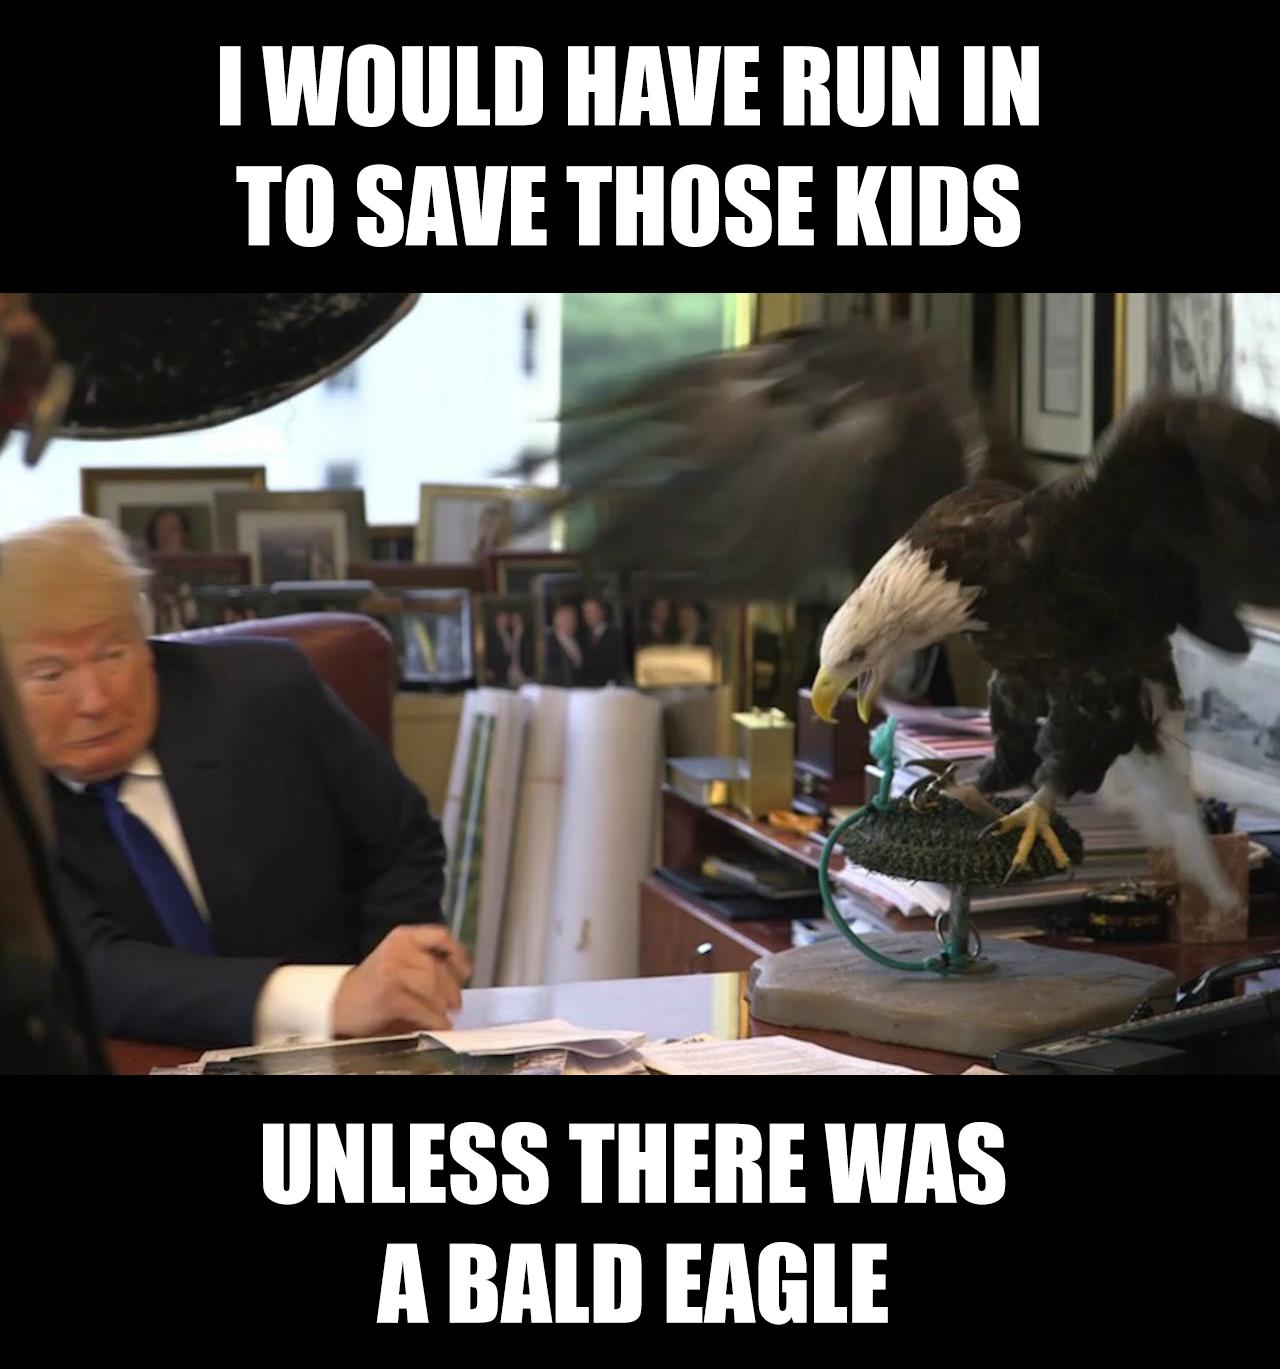 15c trump vs eagle donald trump know your meme